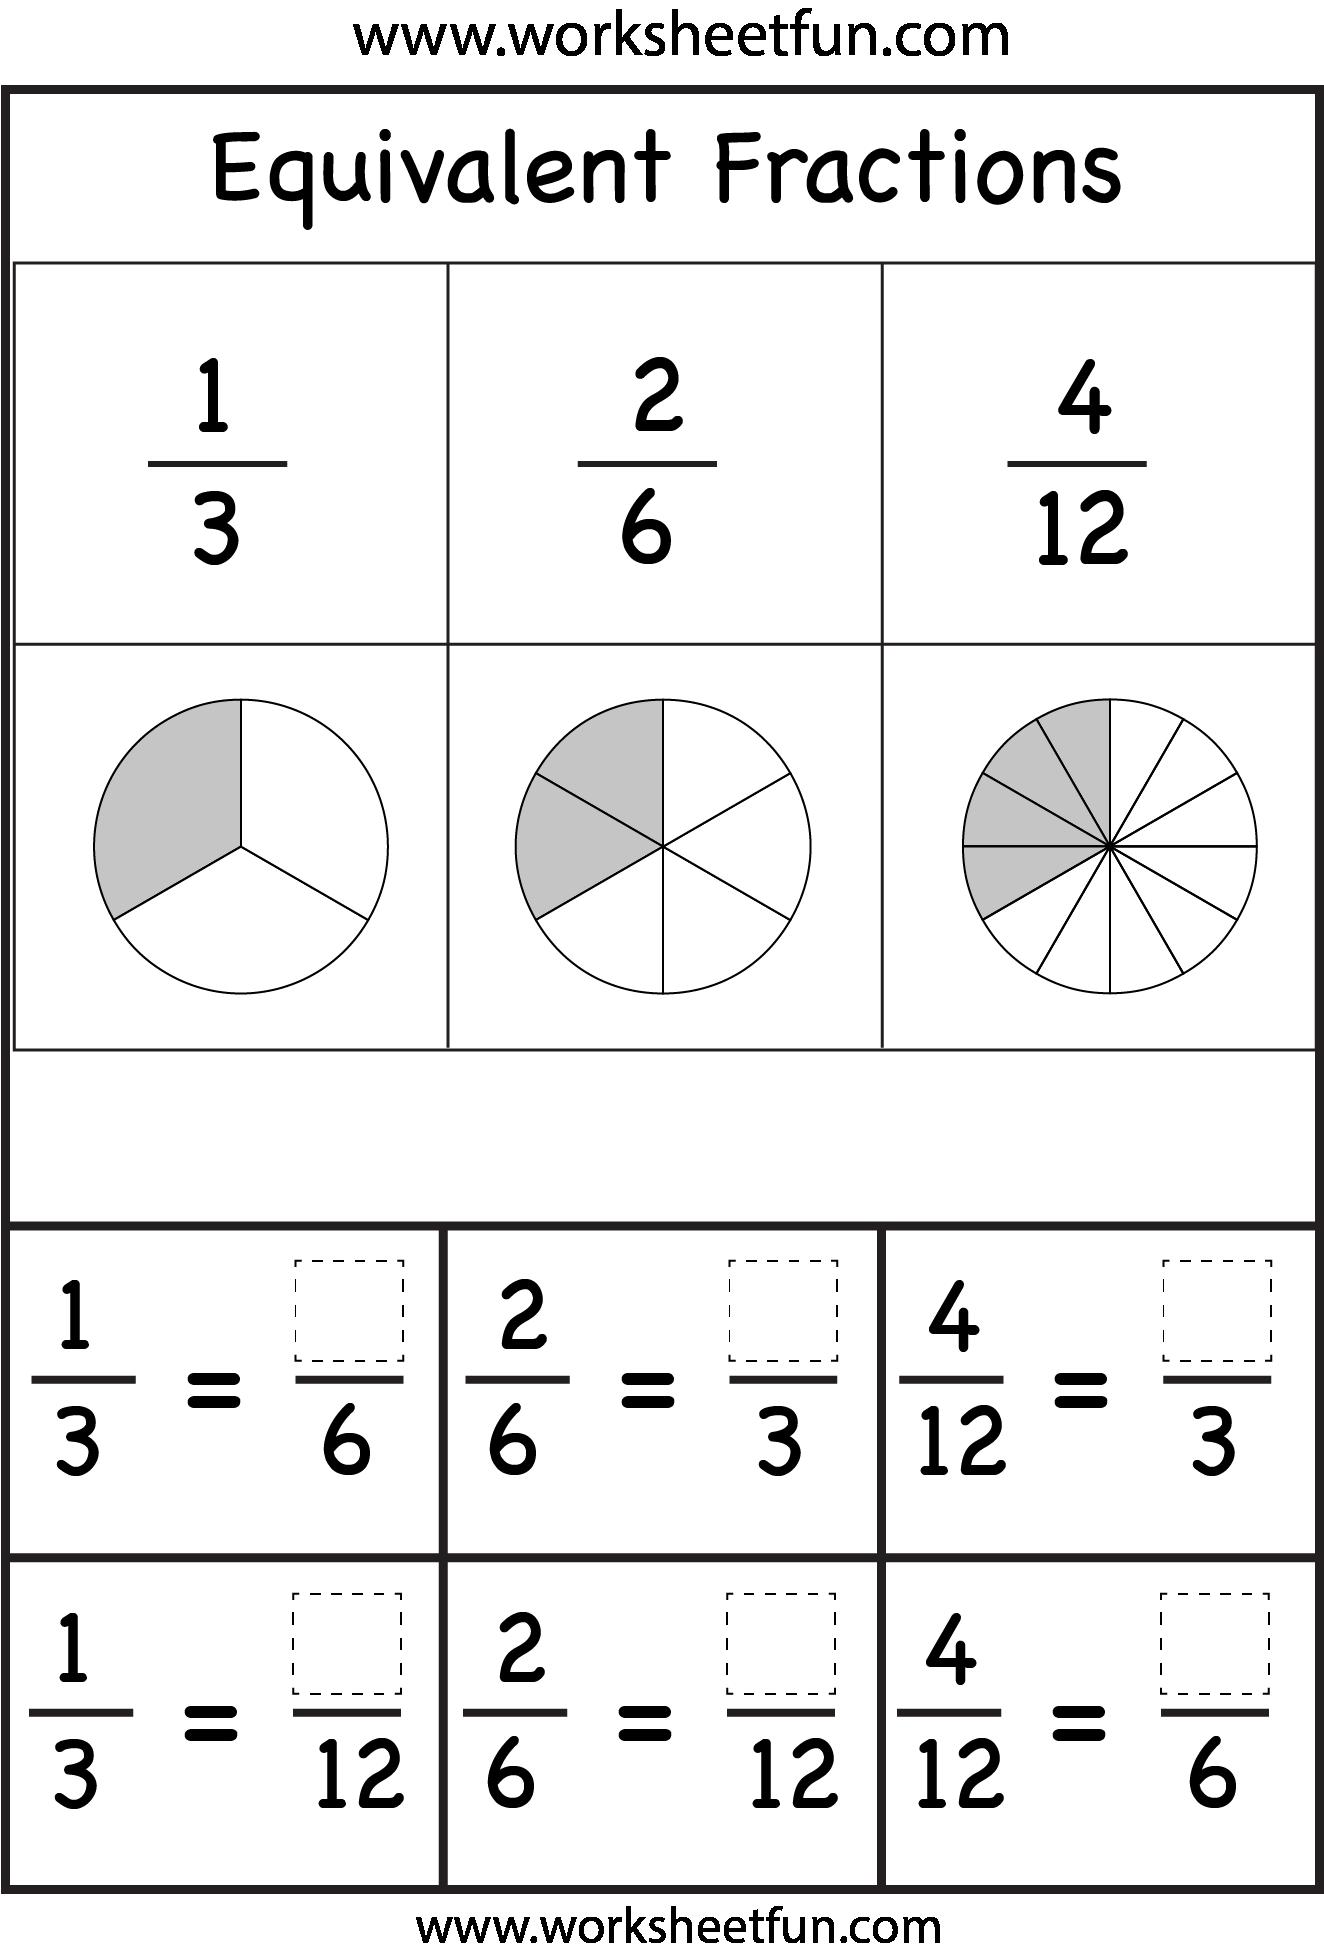 worksheet Teaching Equivalent Fractions Worksheets equivalent fractions worksheets printable pinterest worksheets